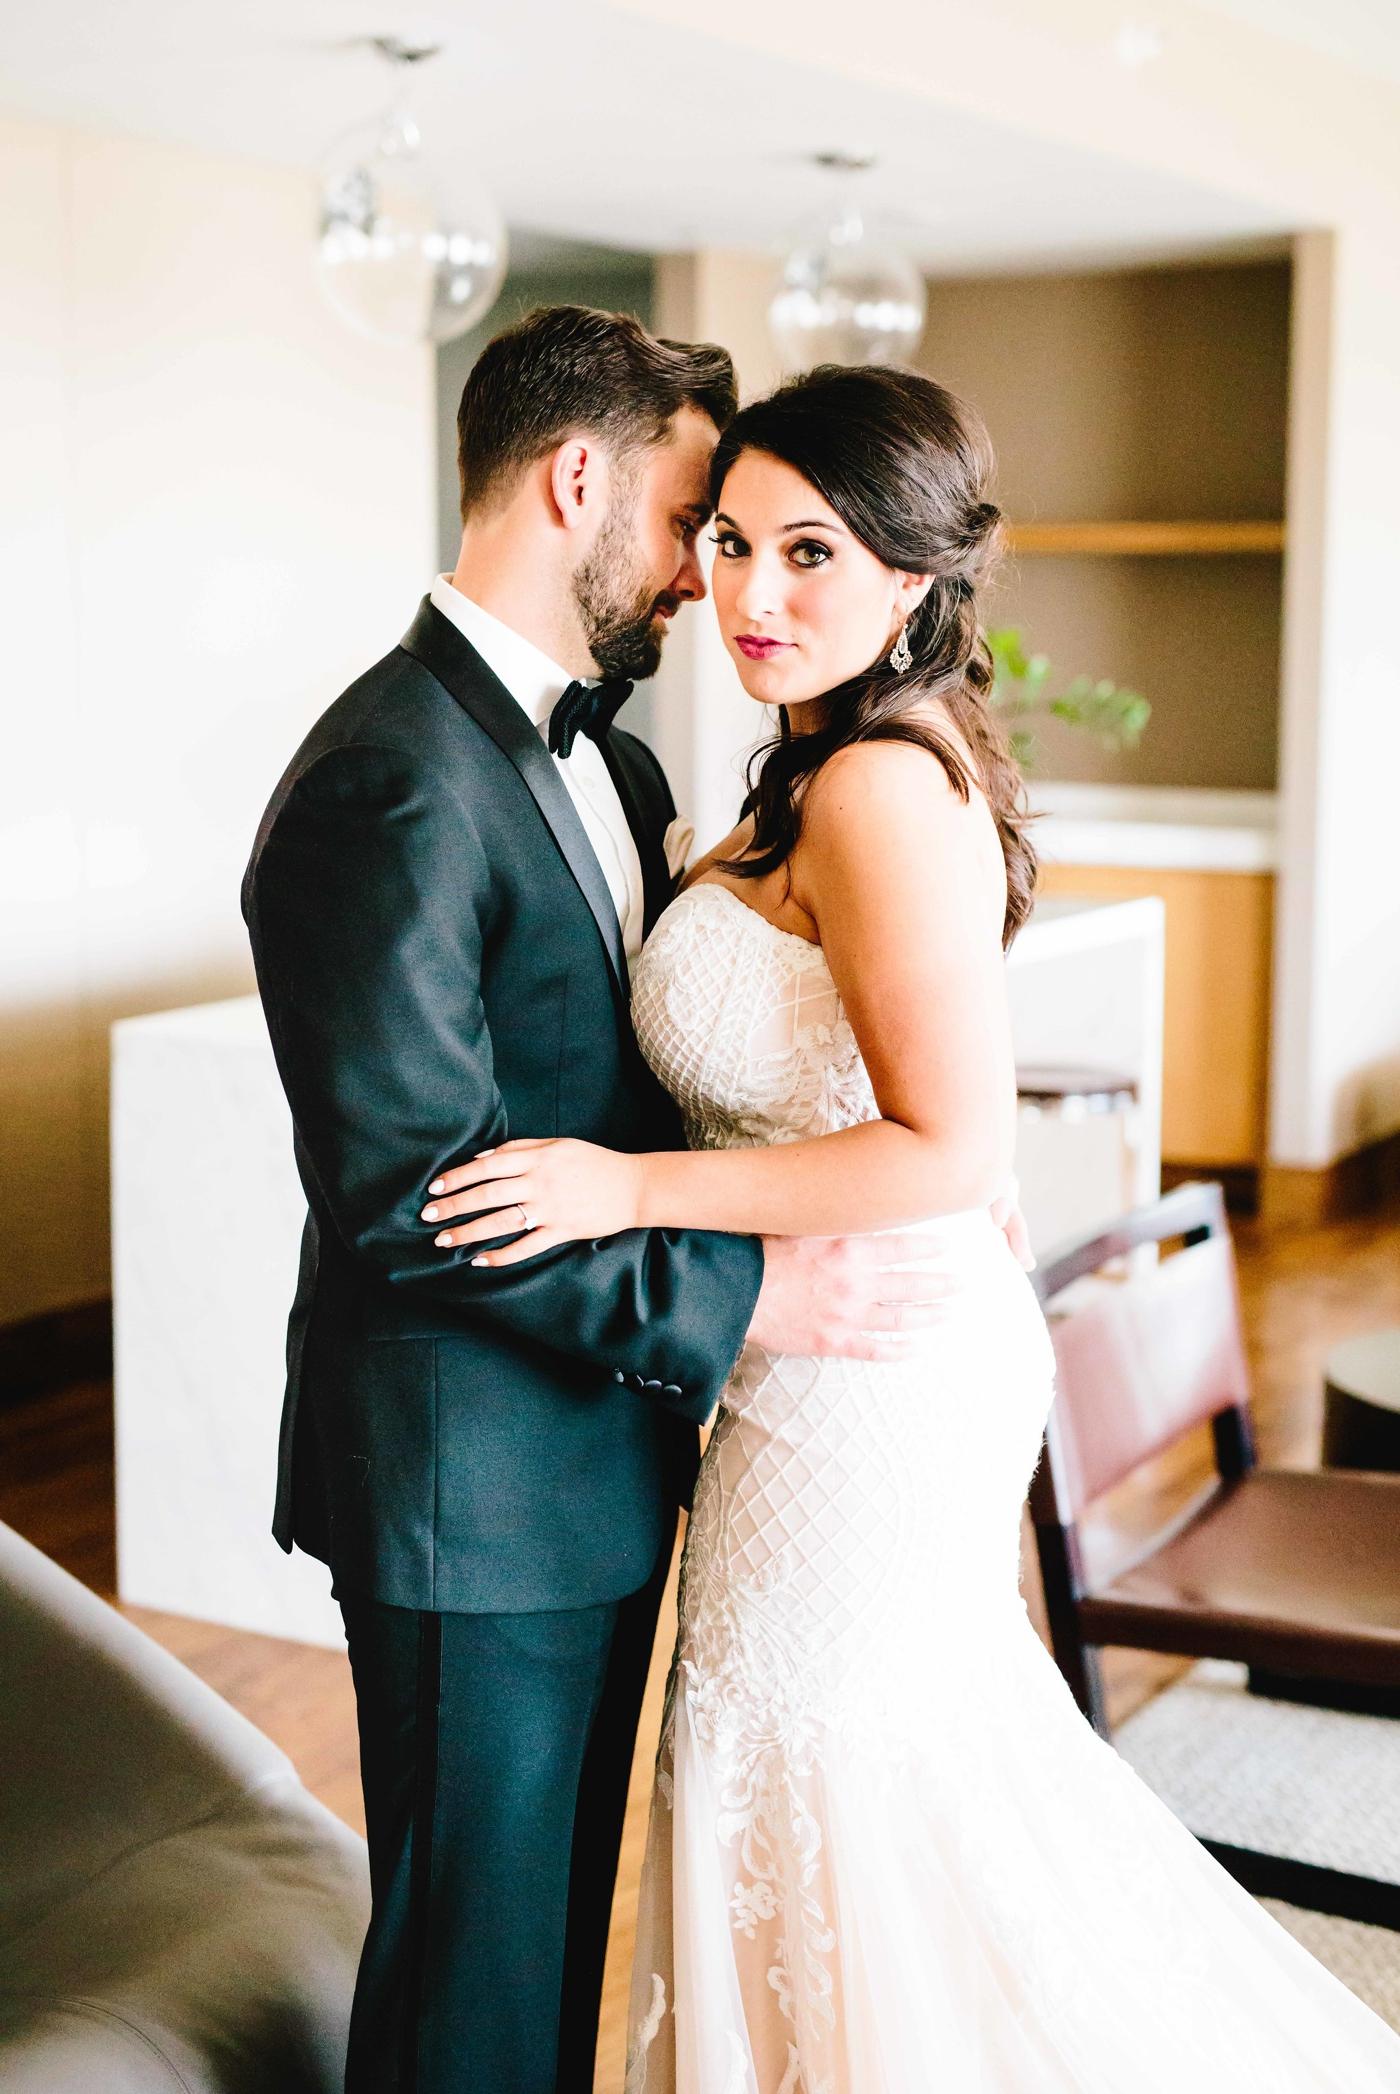 chicago-fine-art-wedding-photography-douglas31